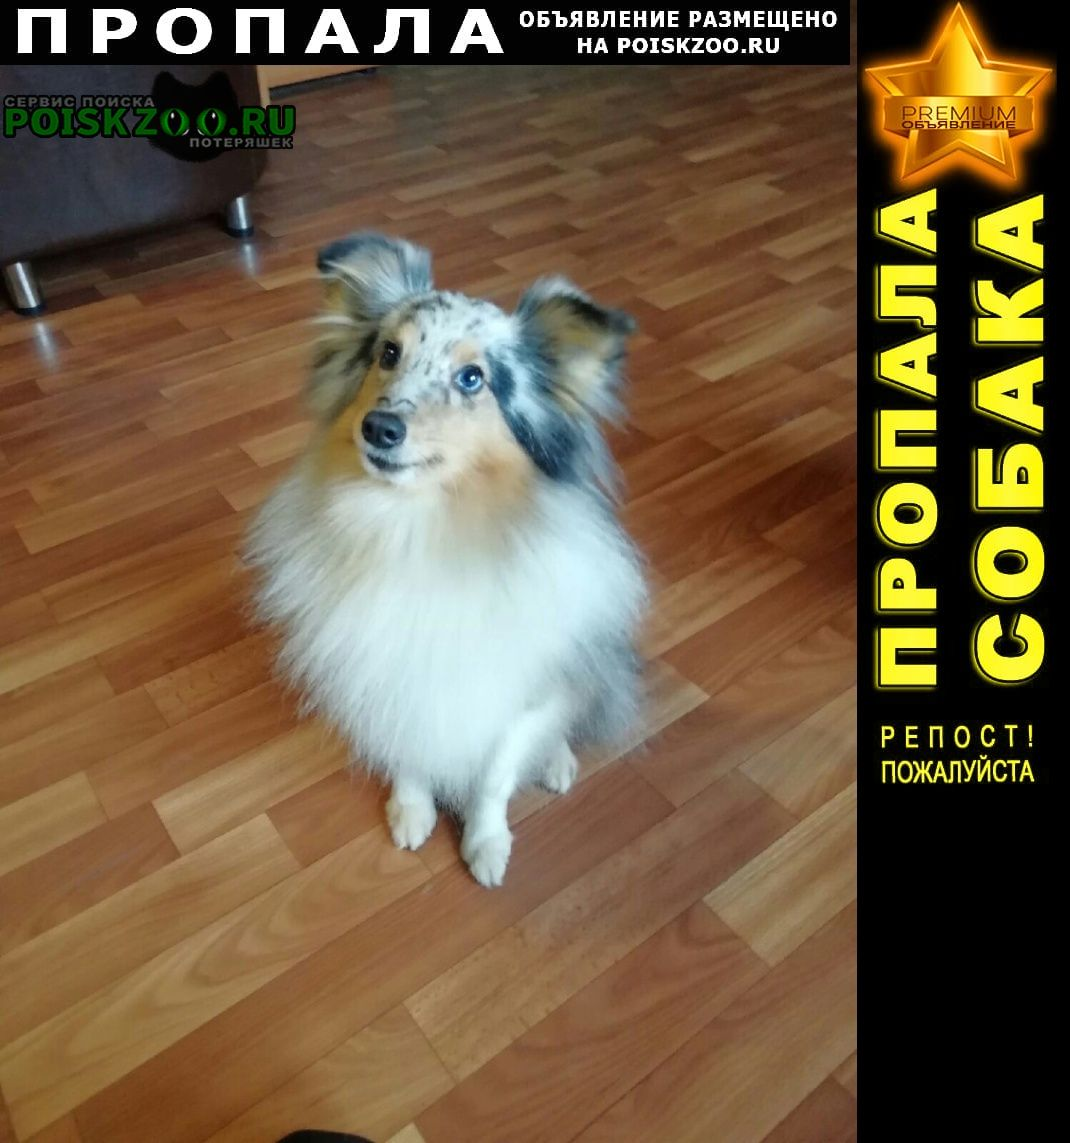 Санкт-Петербург Пропала собака породы шелти